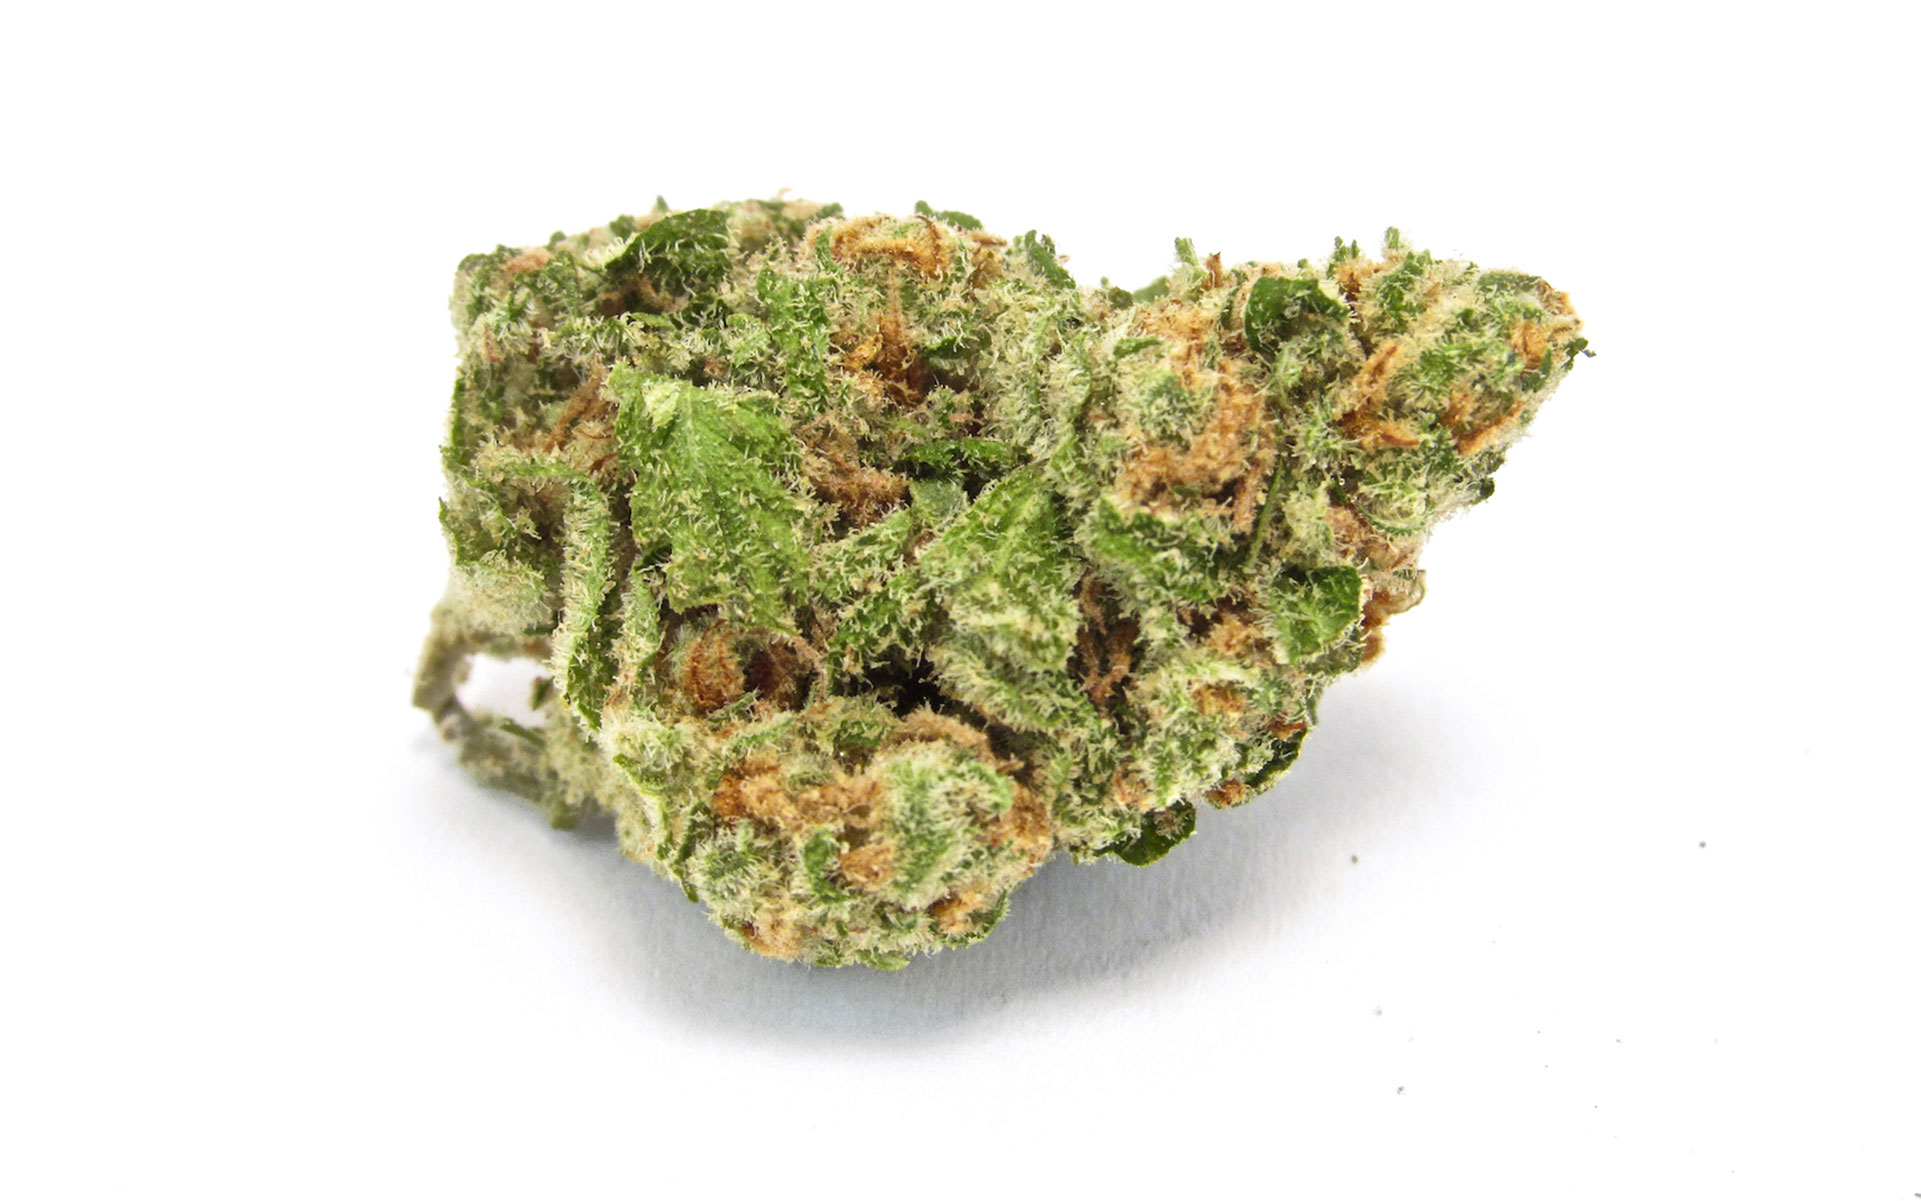 The Top 9 Cannabis Strains Of The Fall 2019 Harvest Season